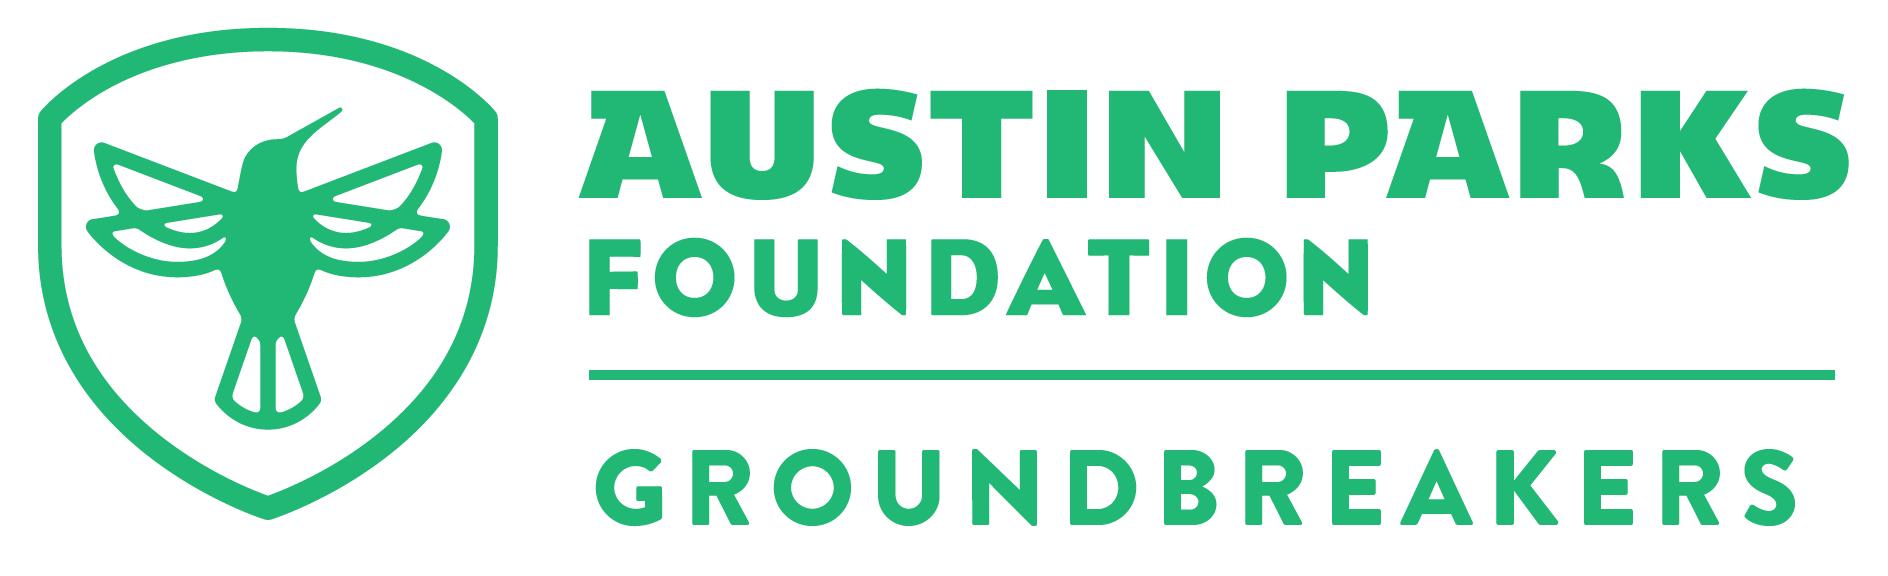 Austin Parks Foundation Groundbreakers